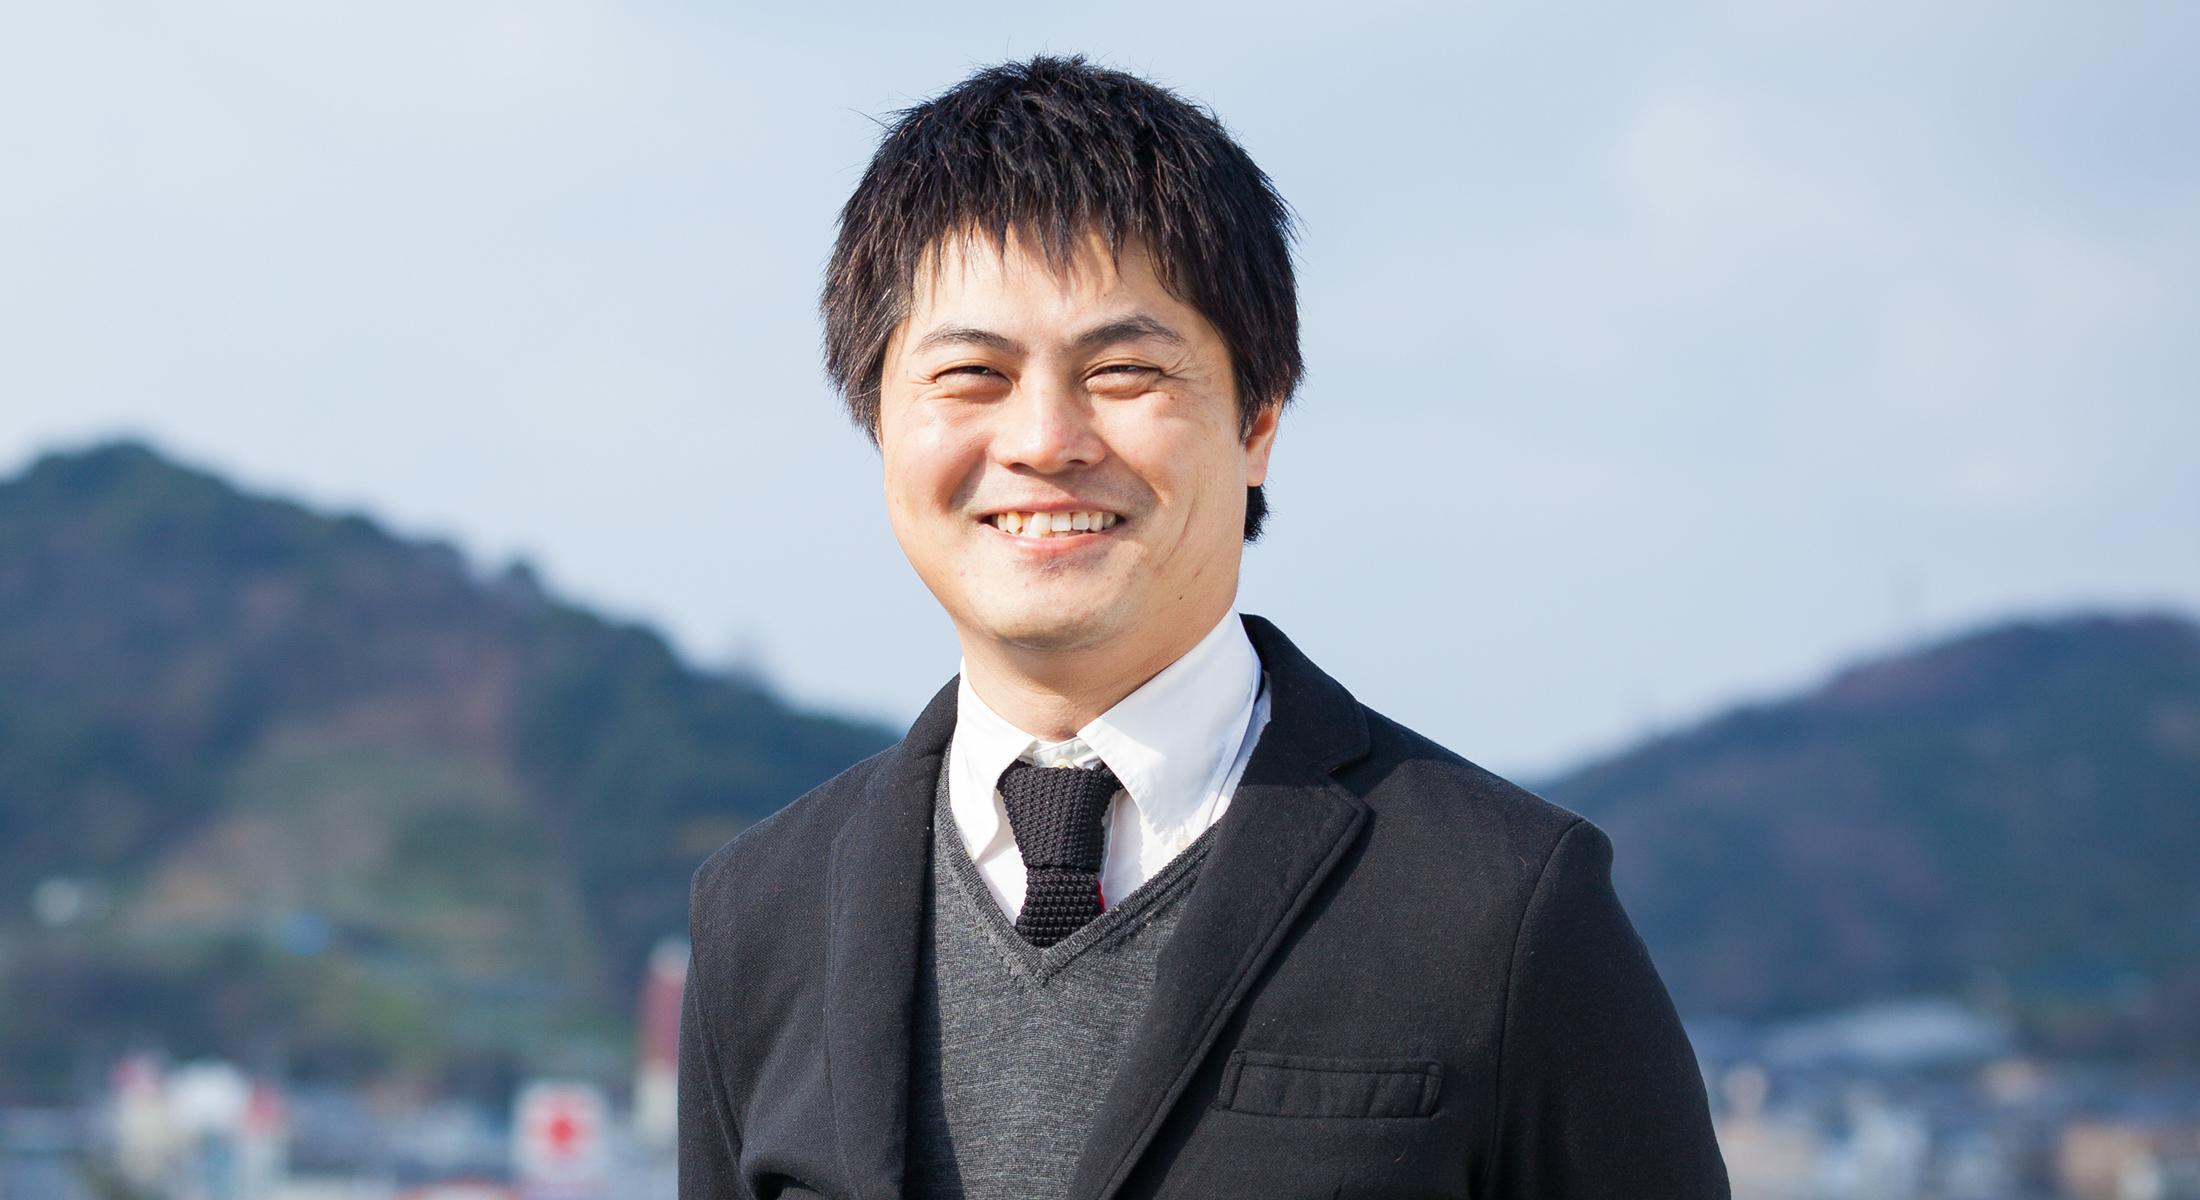 SHIGEKI MATSUBARA